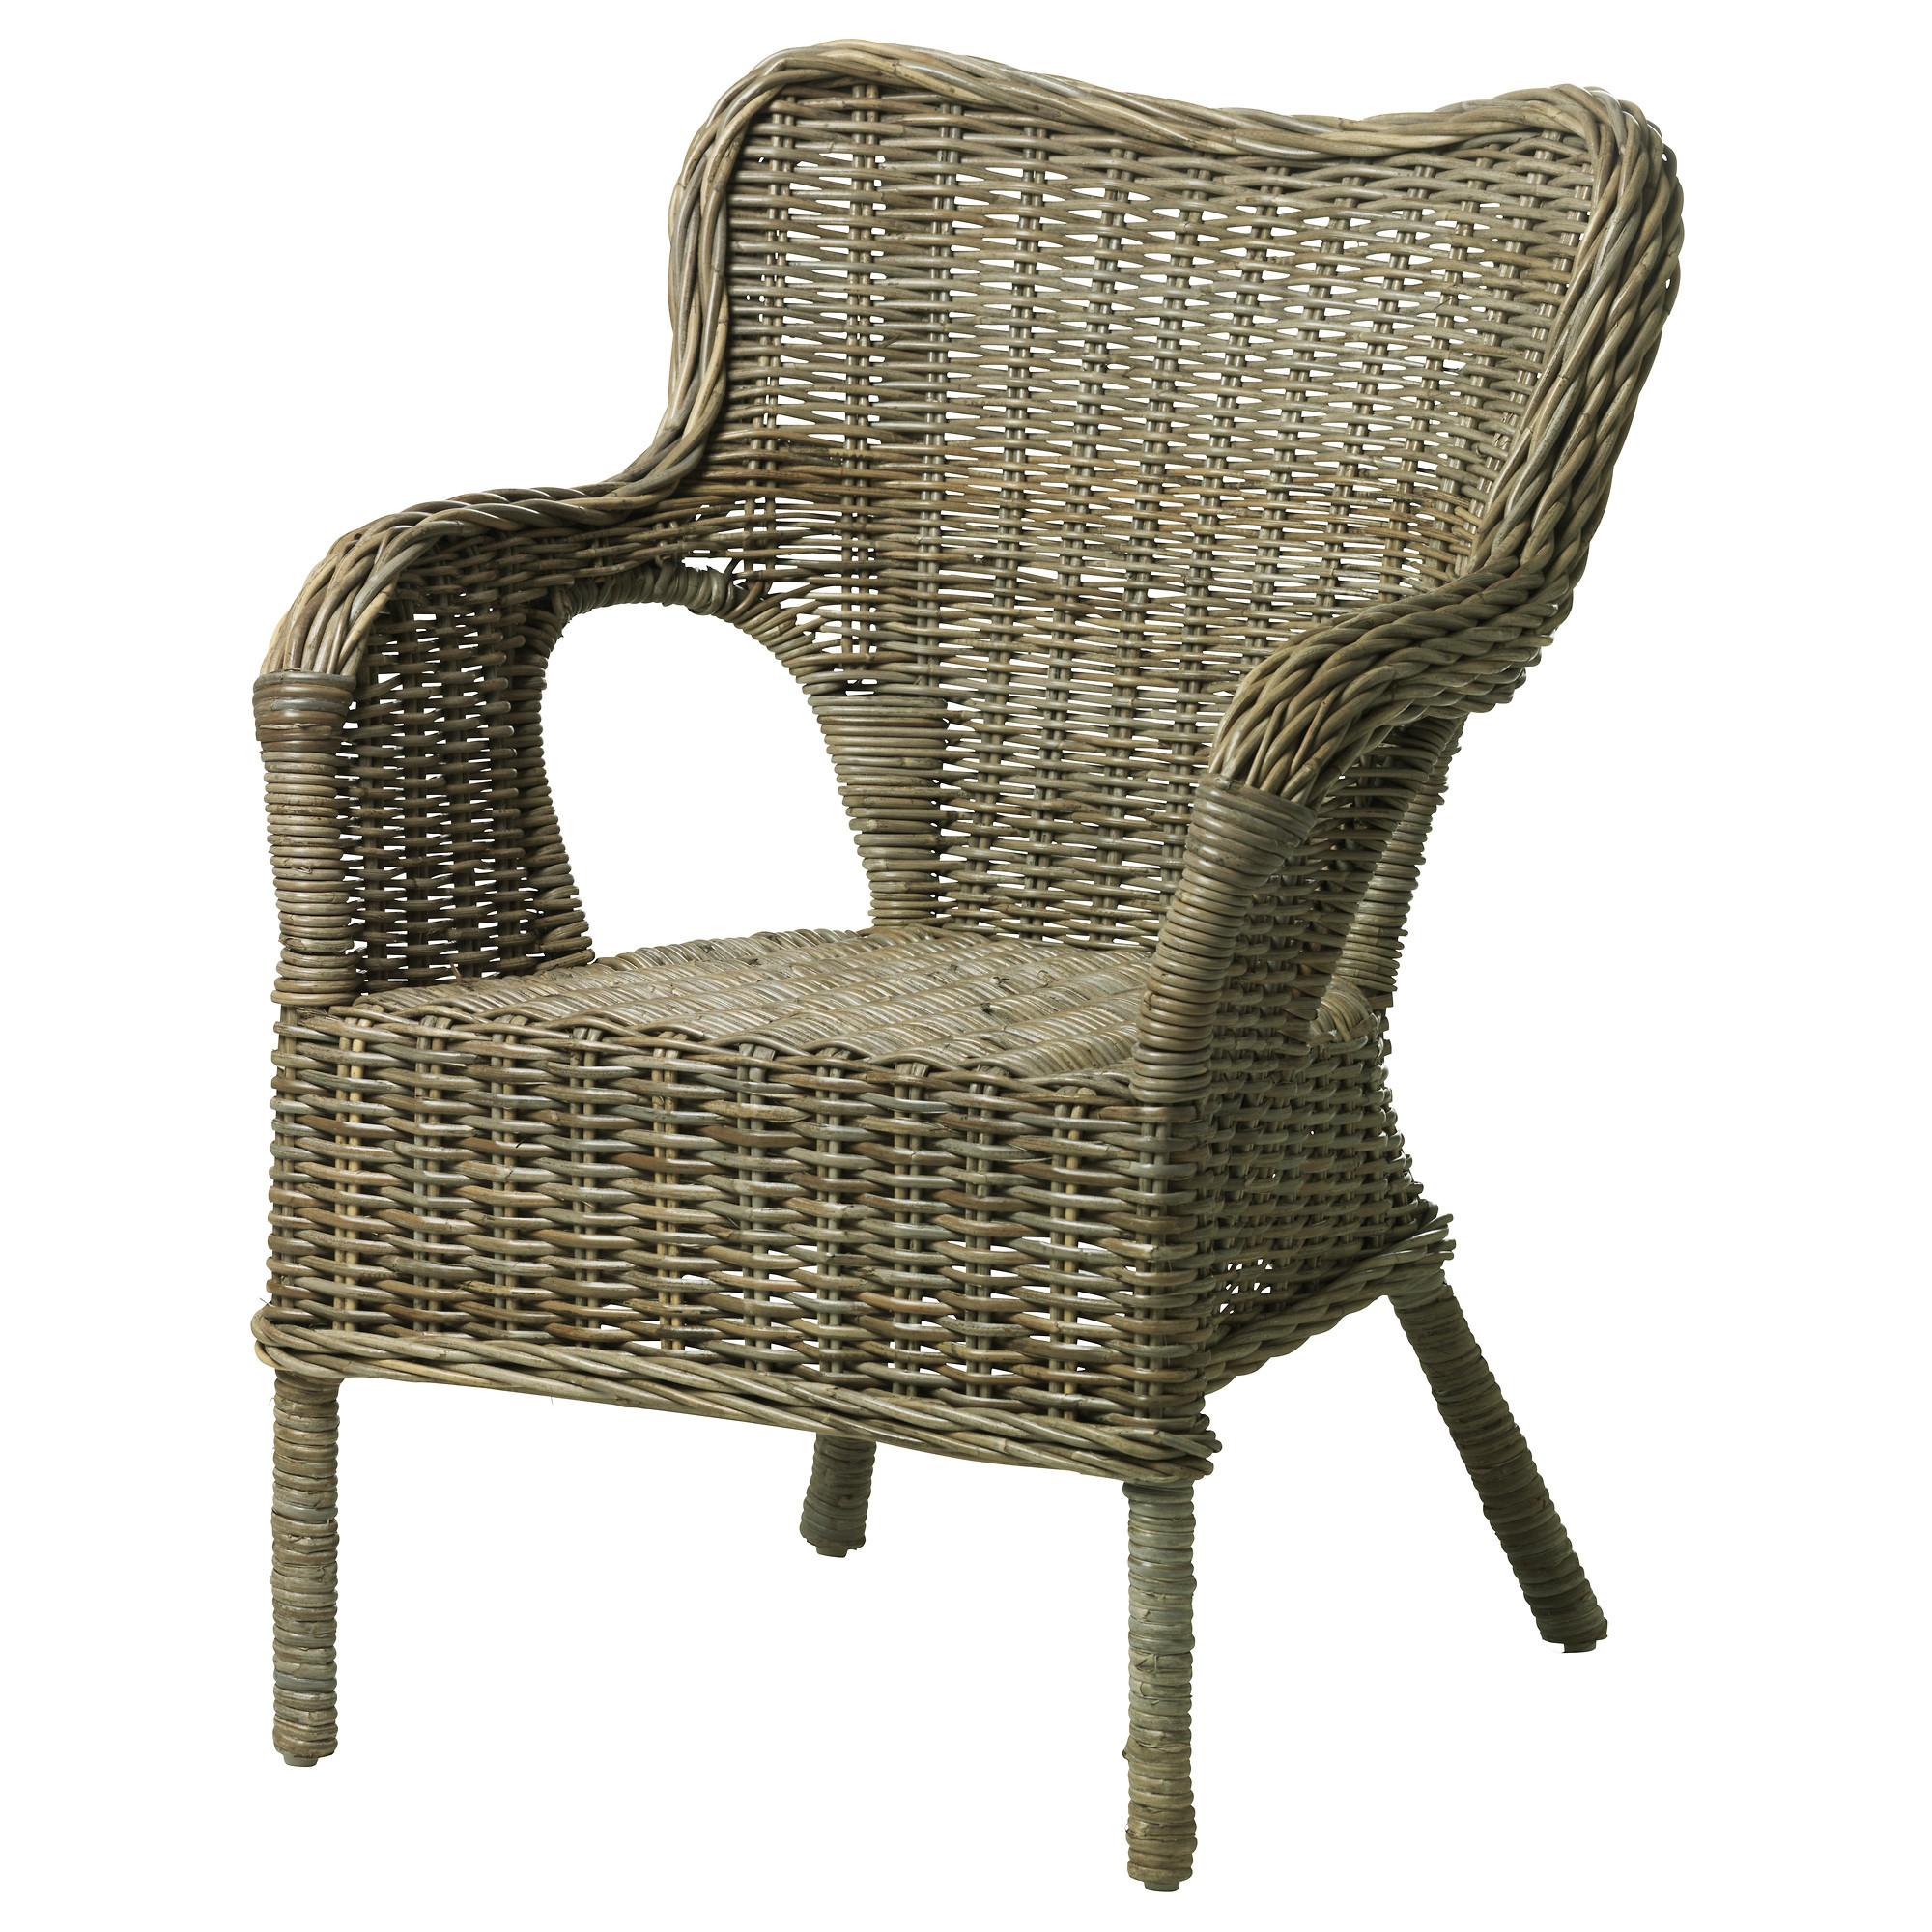 rattan chairs byholma chair, gray width: 26 3/4  QLSVTBE